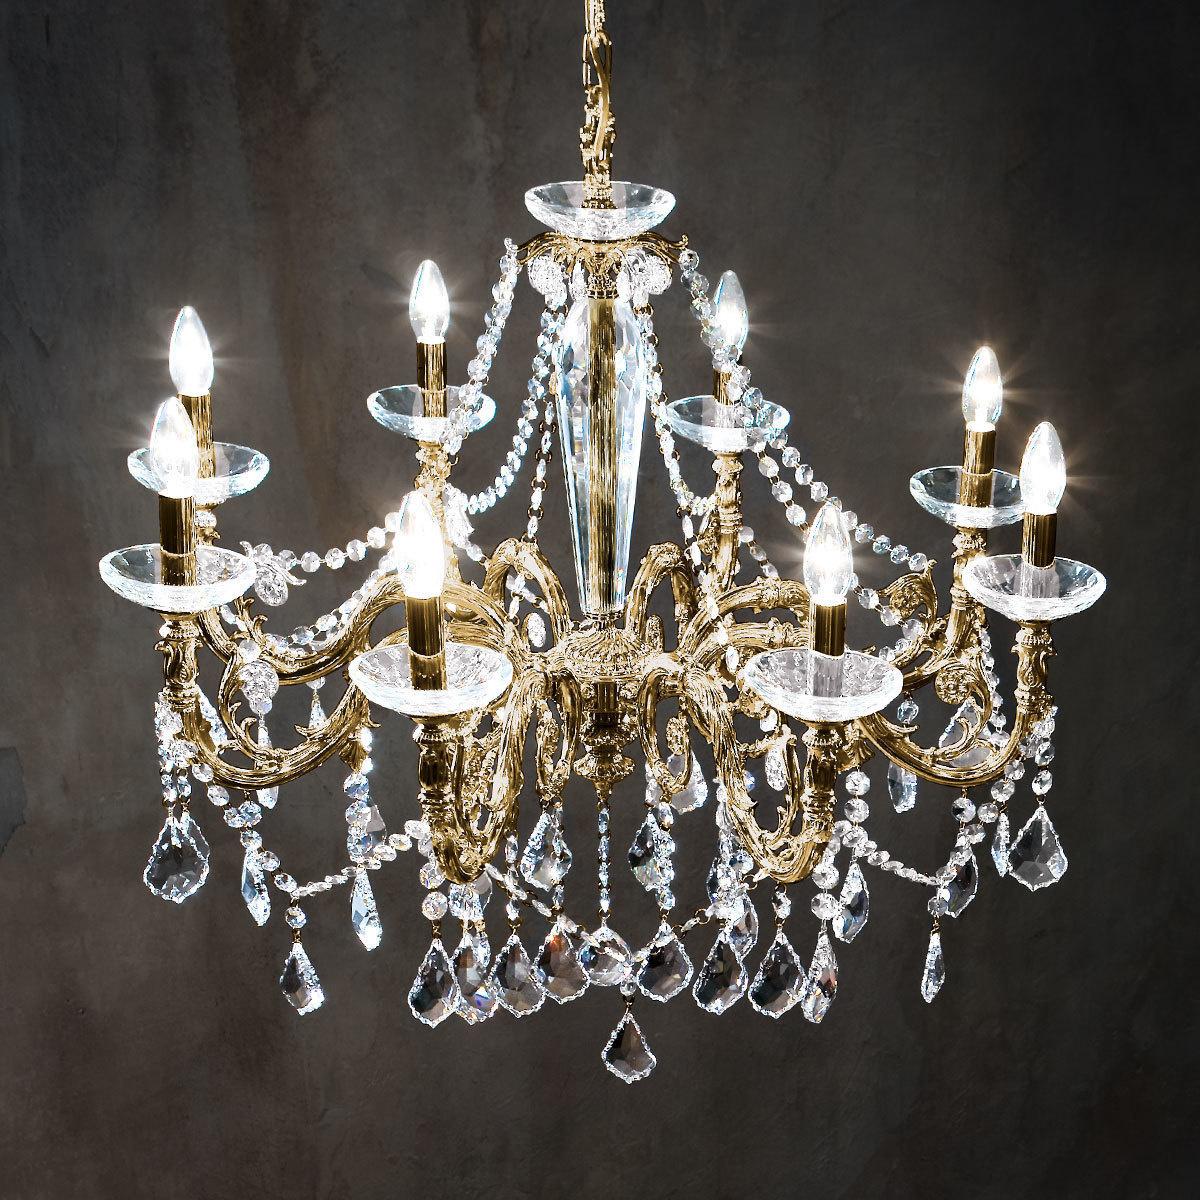 Chandelier Contarini Crystal Antique Brass O85 8 Lights Antique Brass O85cm Height 76cm Min Height 99cm Max Height 144cm 8 Lights E14 Kolarz Shop